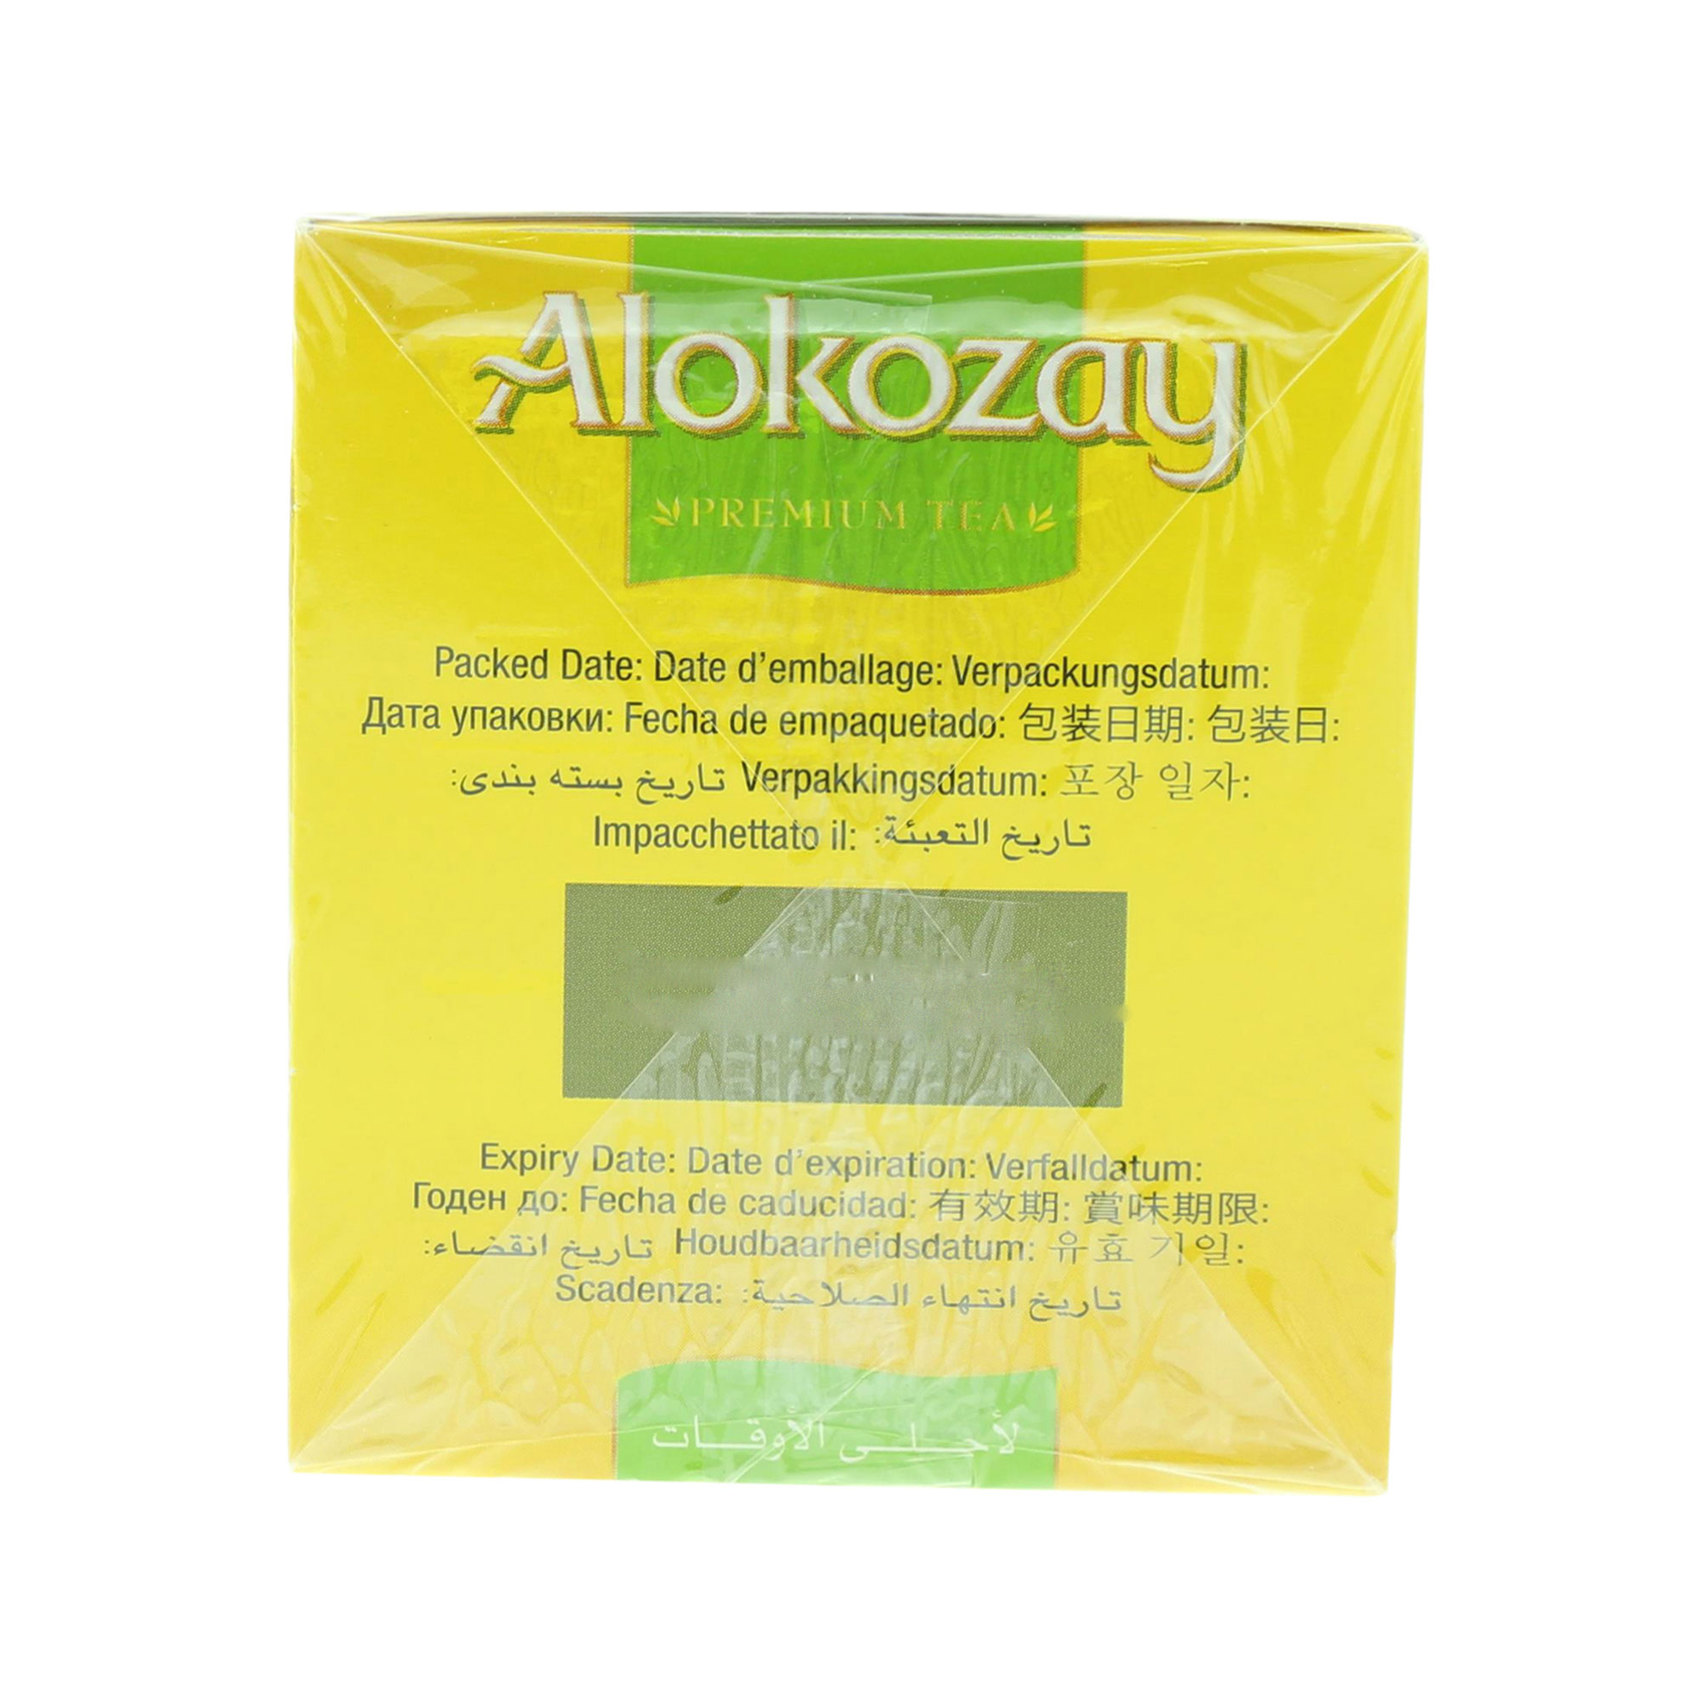 ALOKOZAY LEMON TEA 25'S 50G